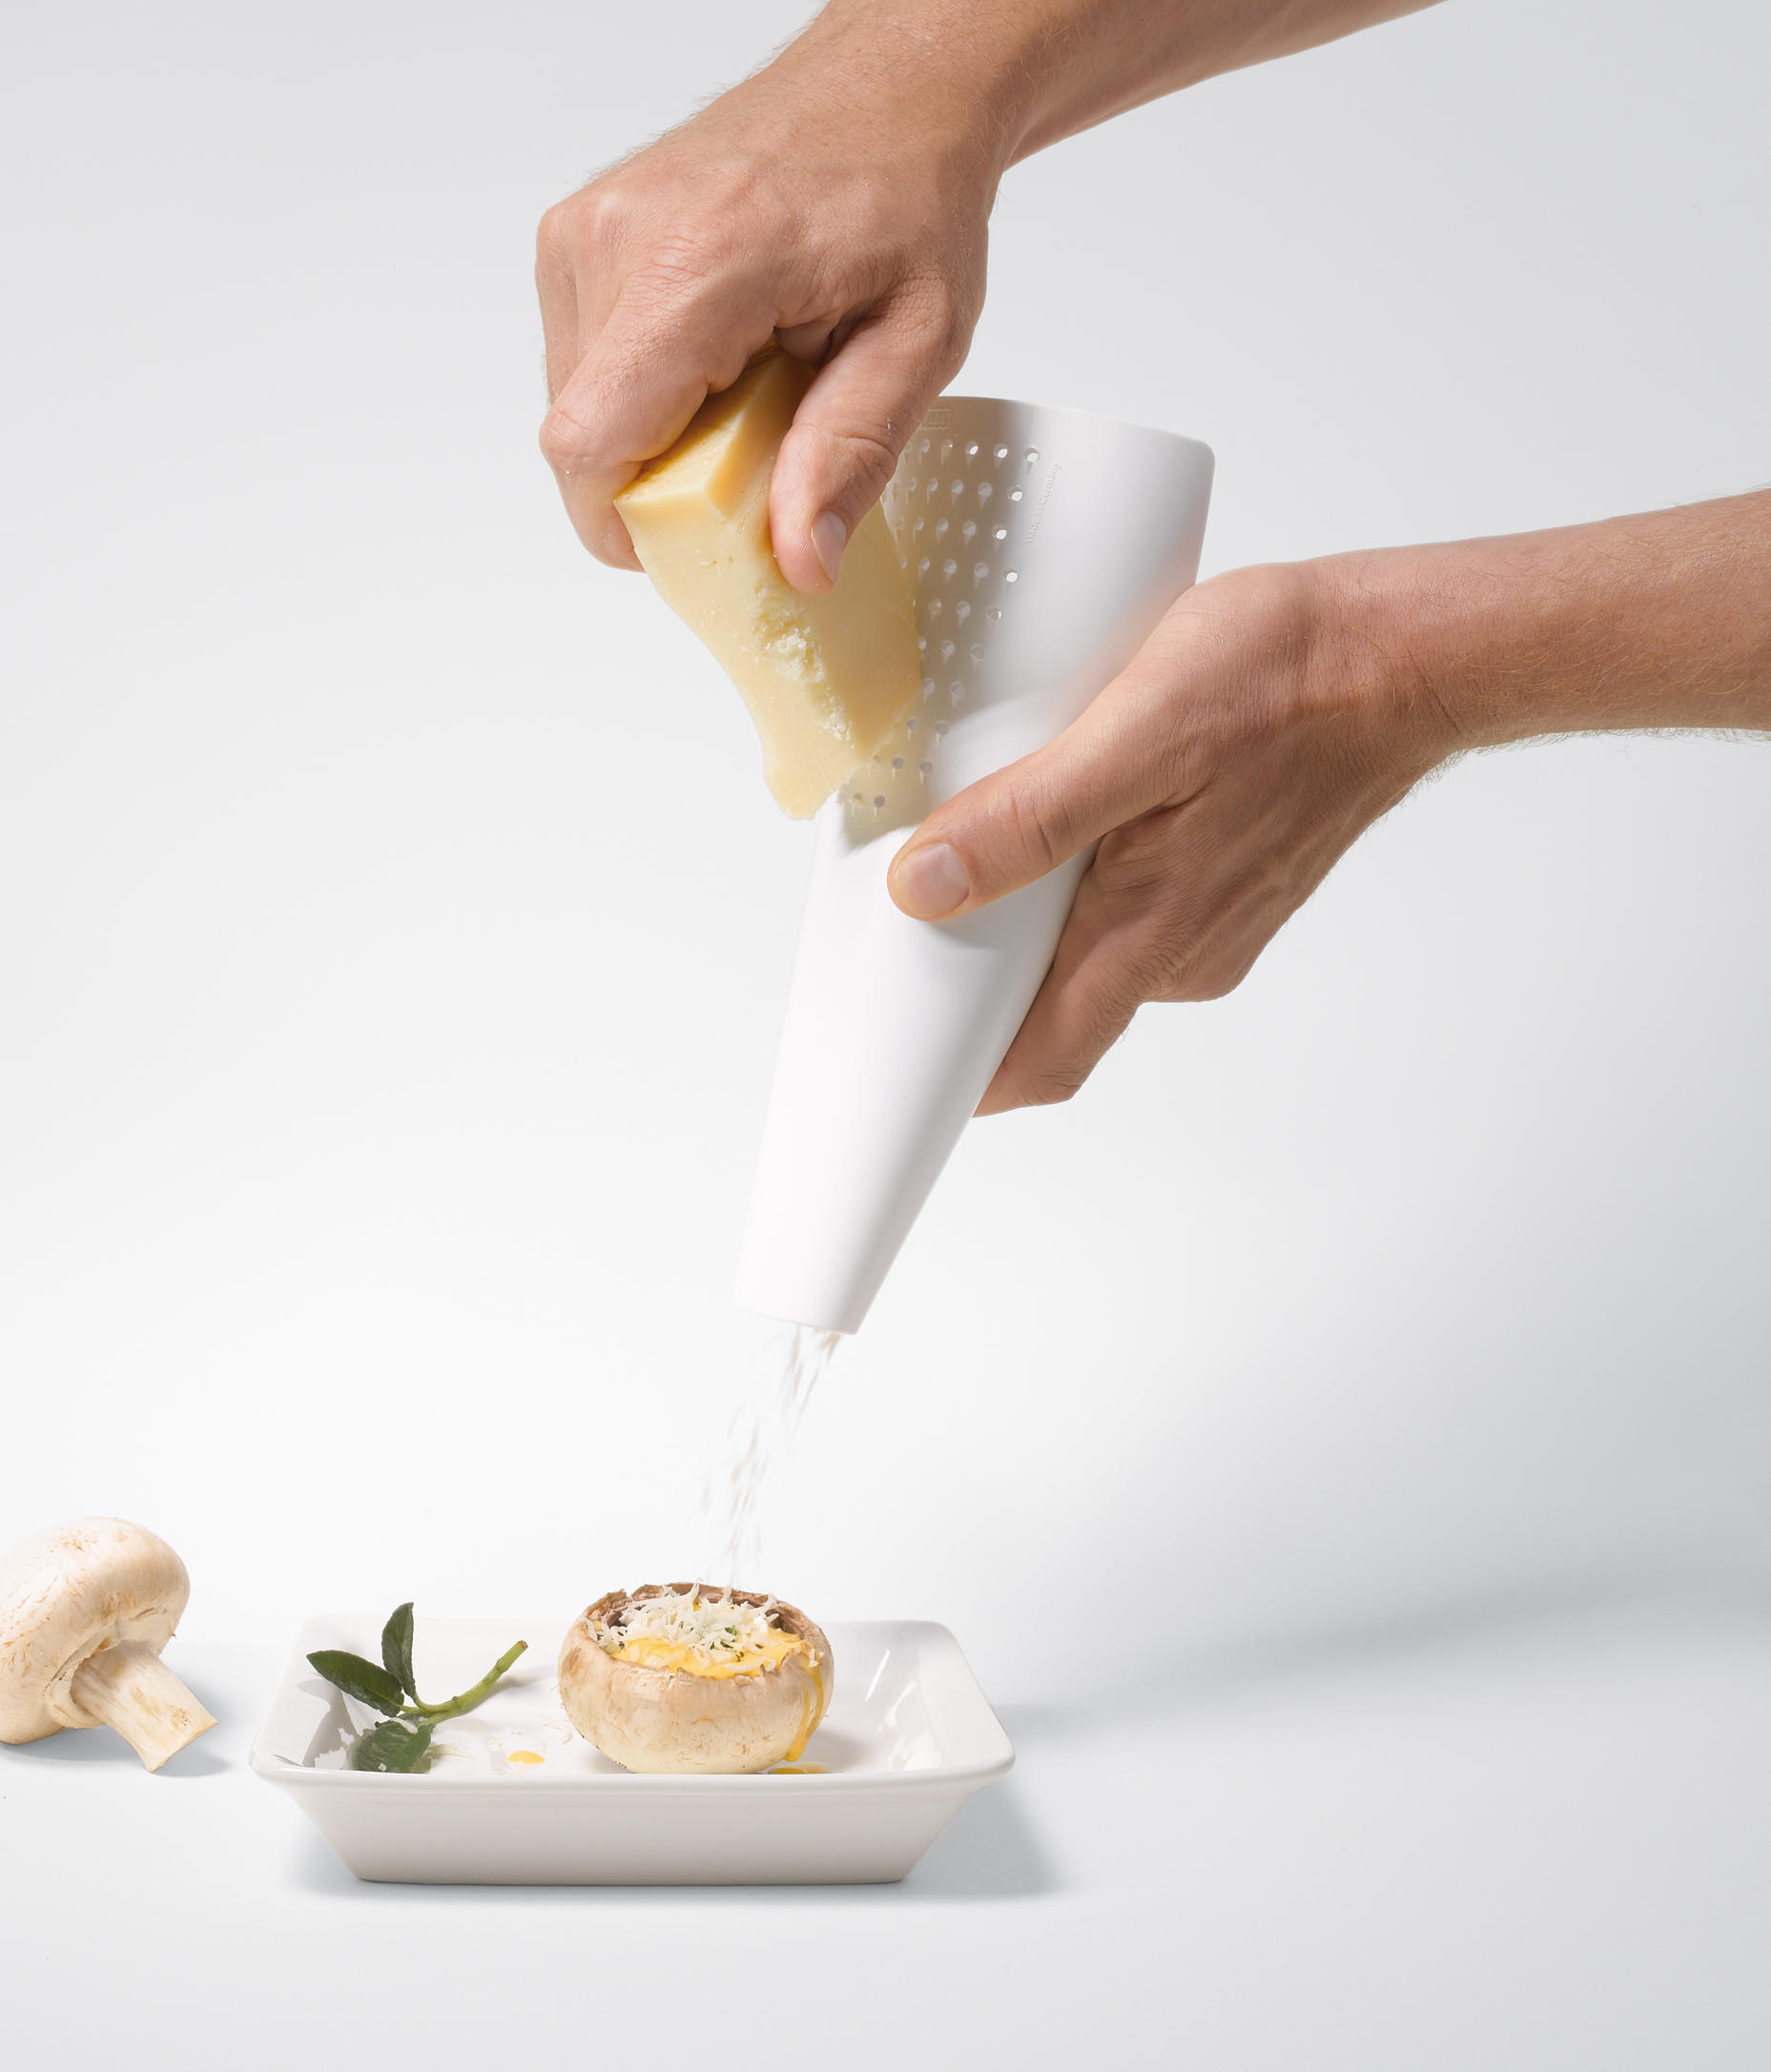 range is crass our shop brass of utensils kitchen cheese food grater part